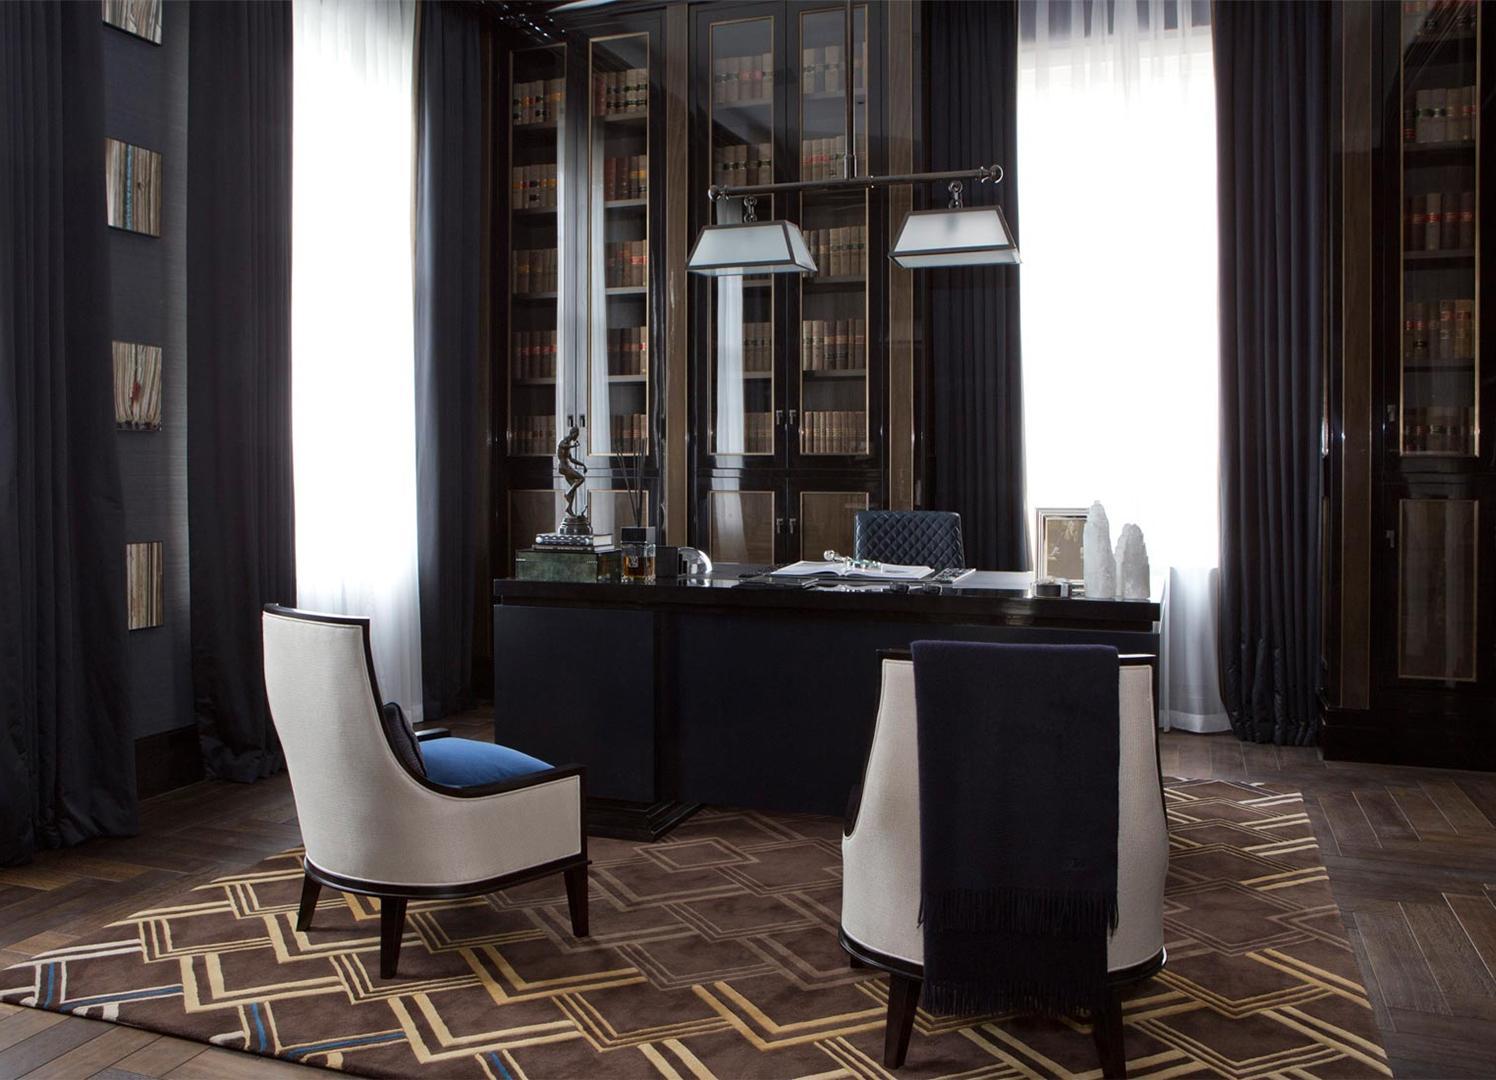 HAMPSTEAD Interior Design By Blush Design (5)